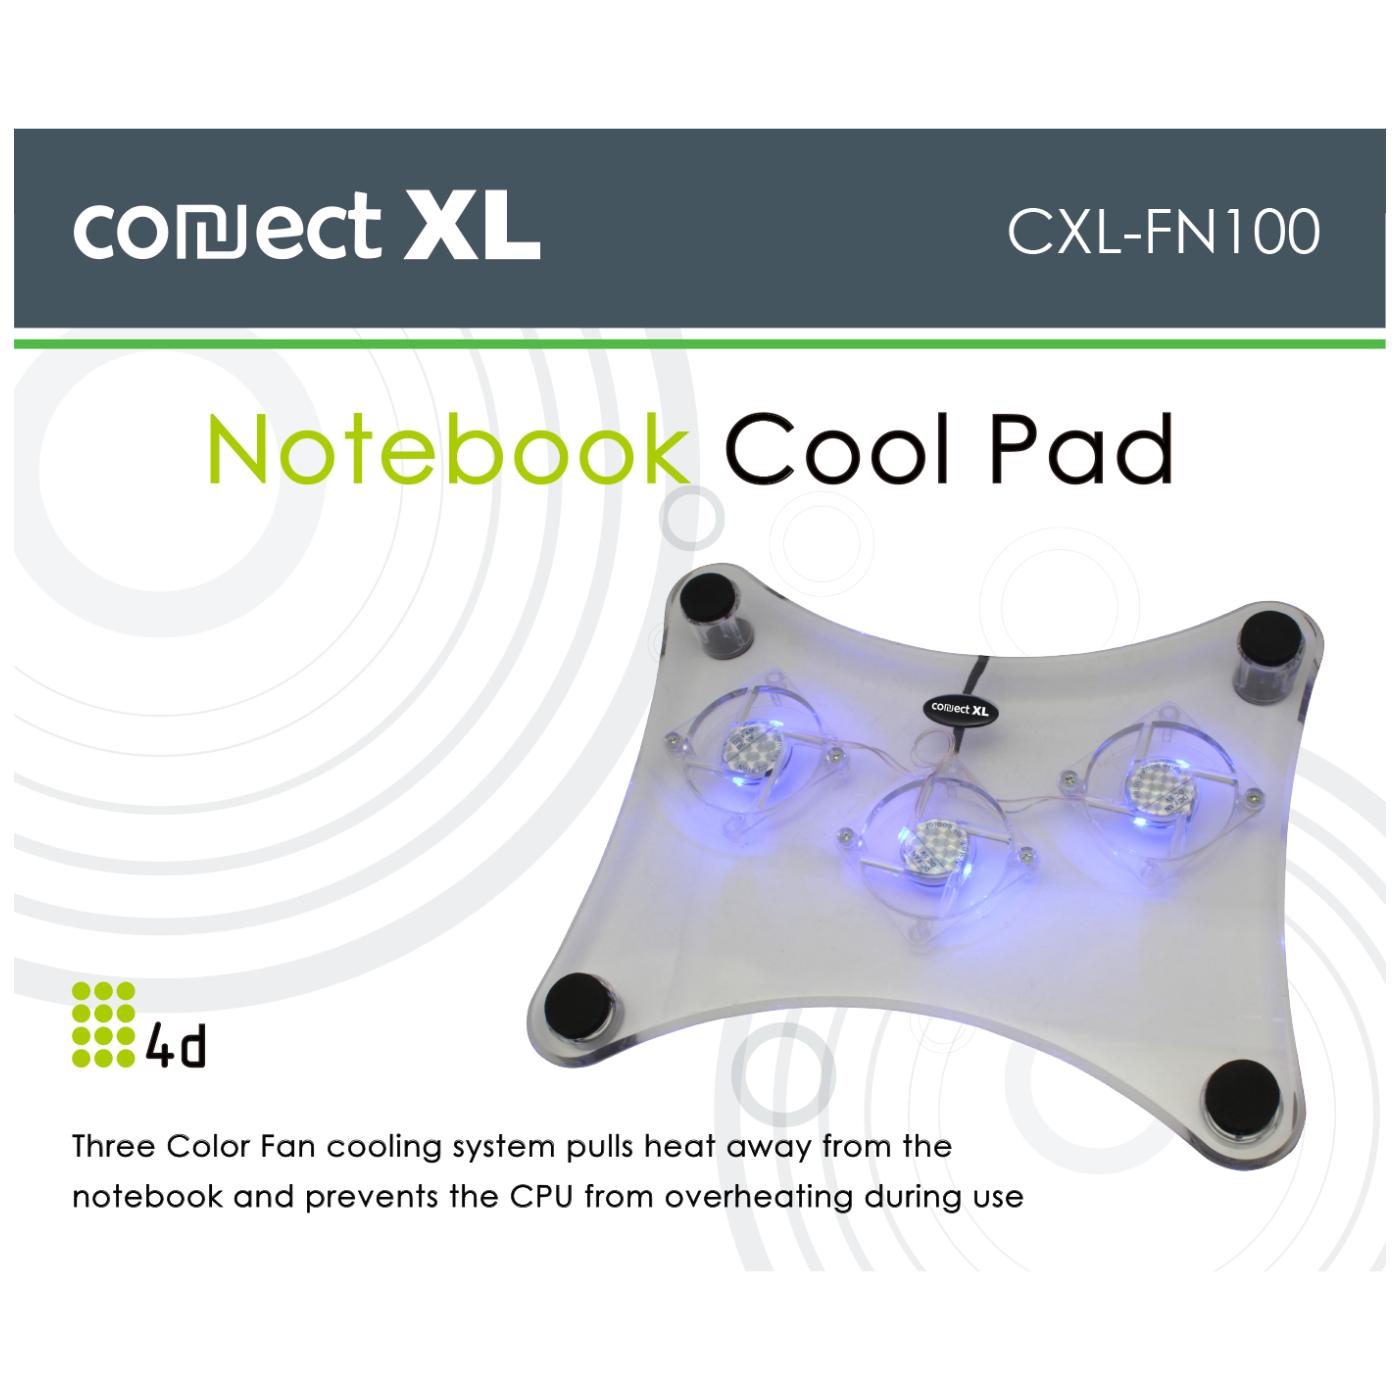 Connect XL - CXL-FN100